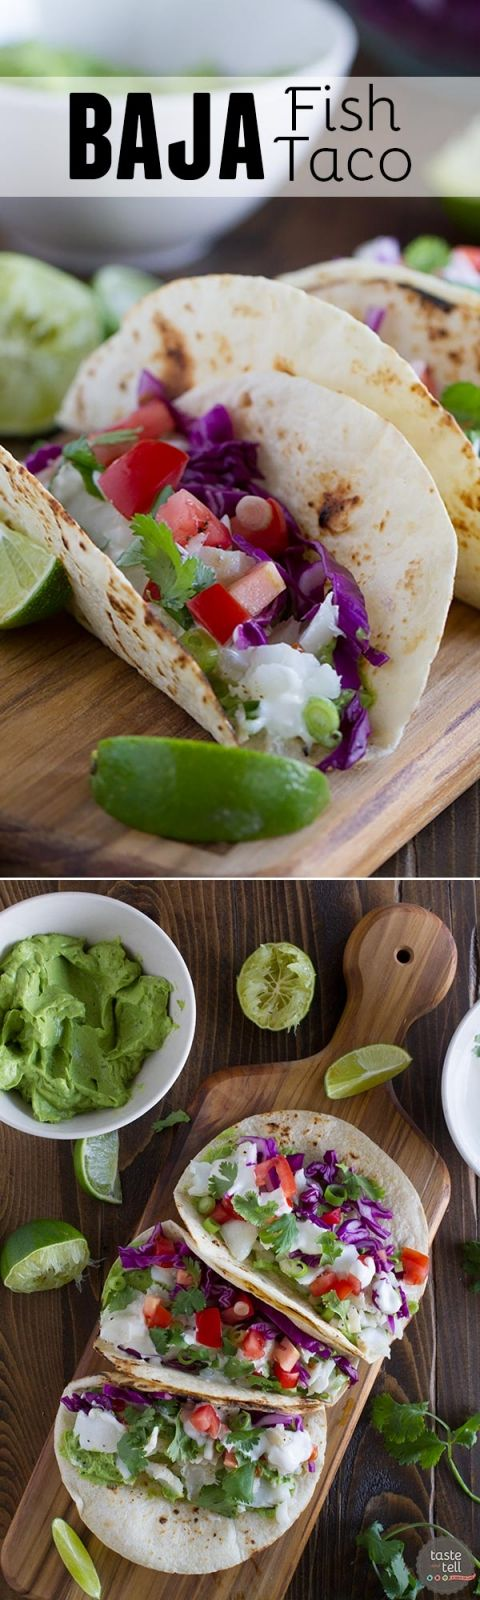 Best 25 baja fish taco recipe ideas on pinterest easy for Baja fish taco sauce